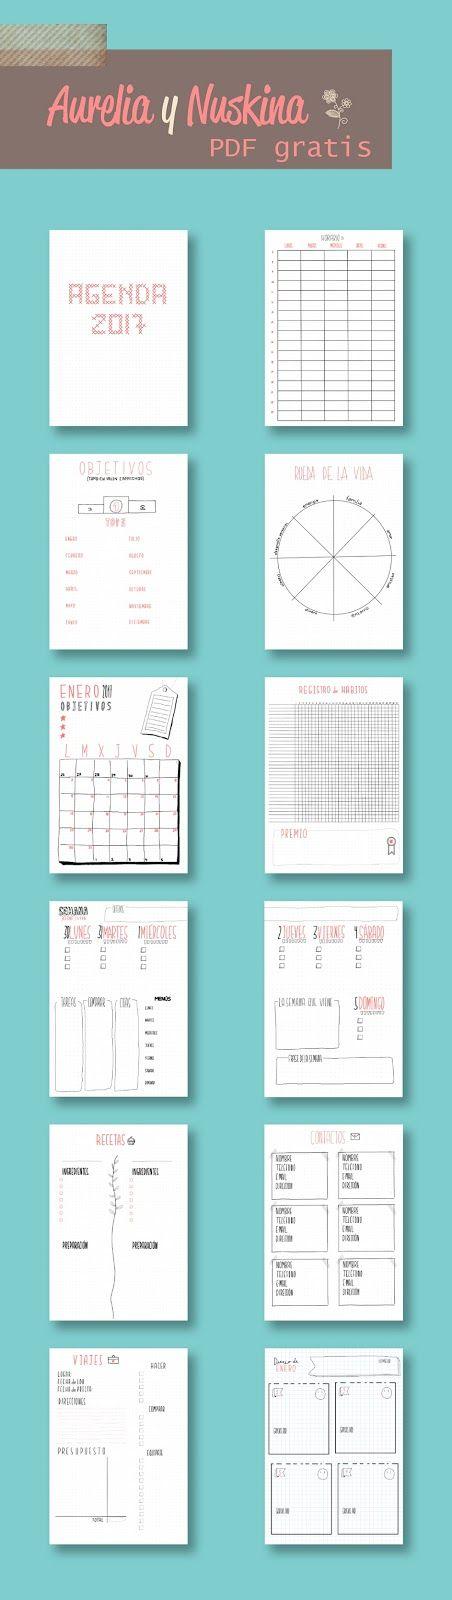 agenda 2017 para imprimir gratis y mas imprimibles gratis